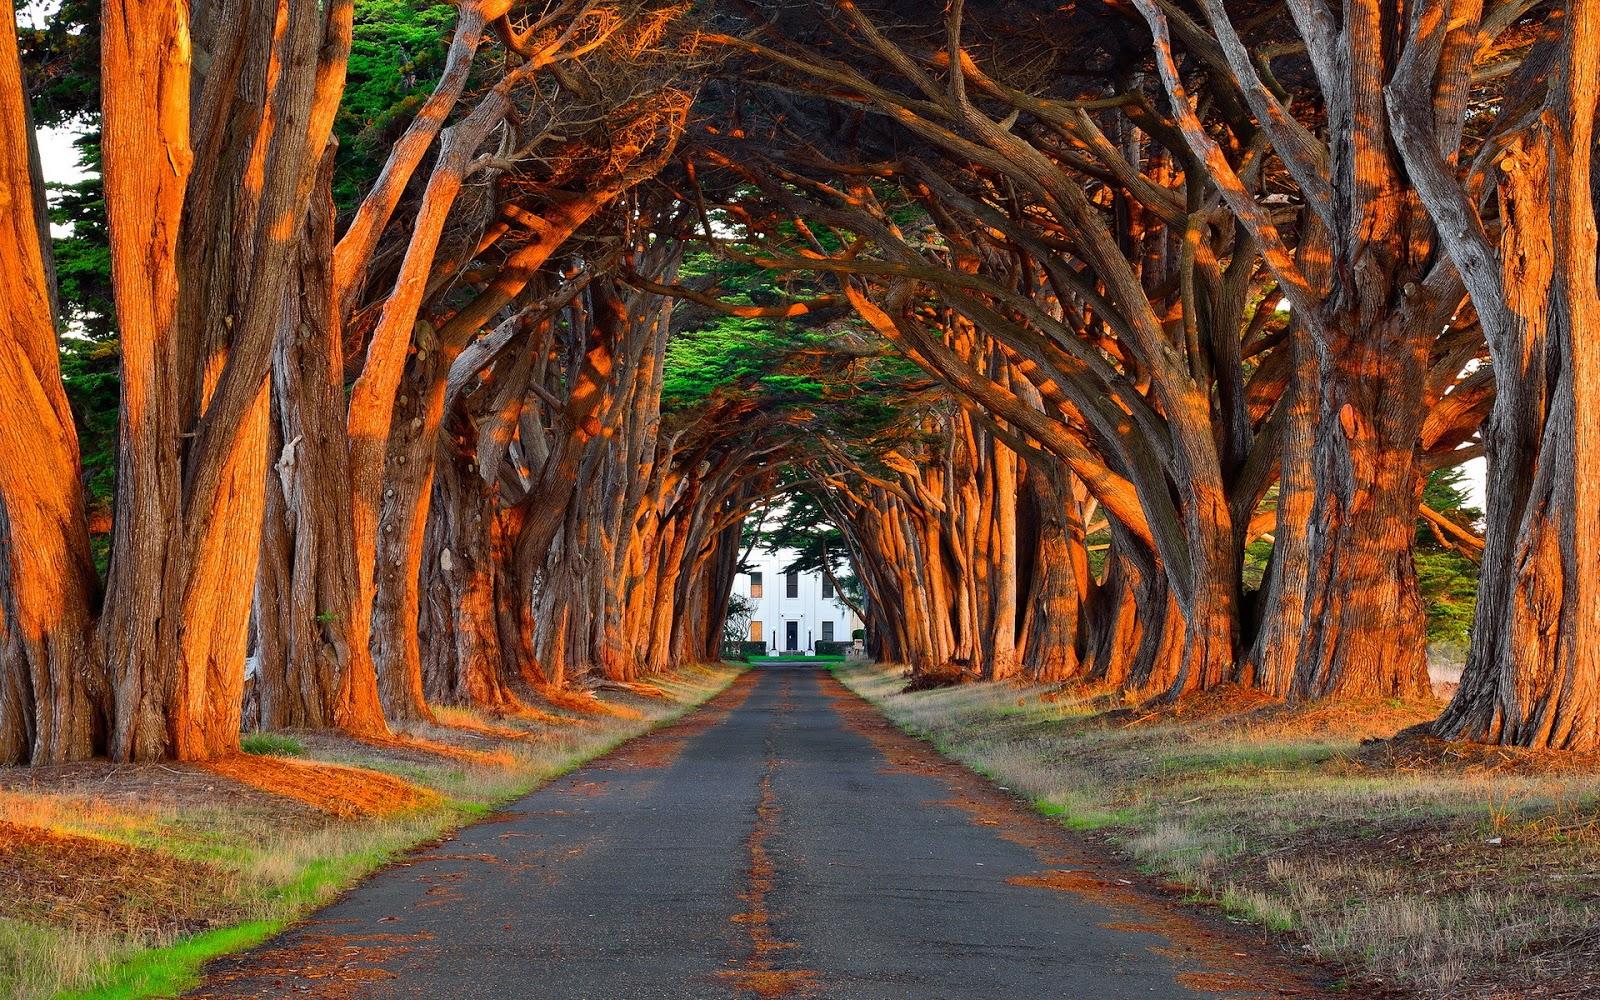 Fondo de pantalla paisaje carretera cubierta de arboles for Fondos de pantalla espectaculares